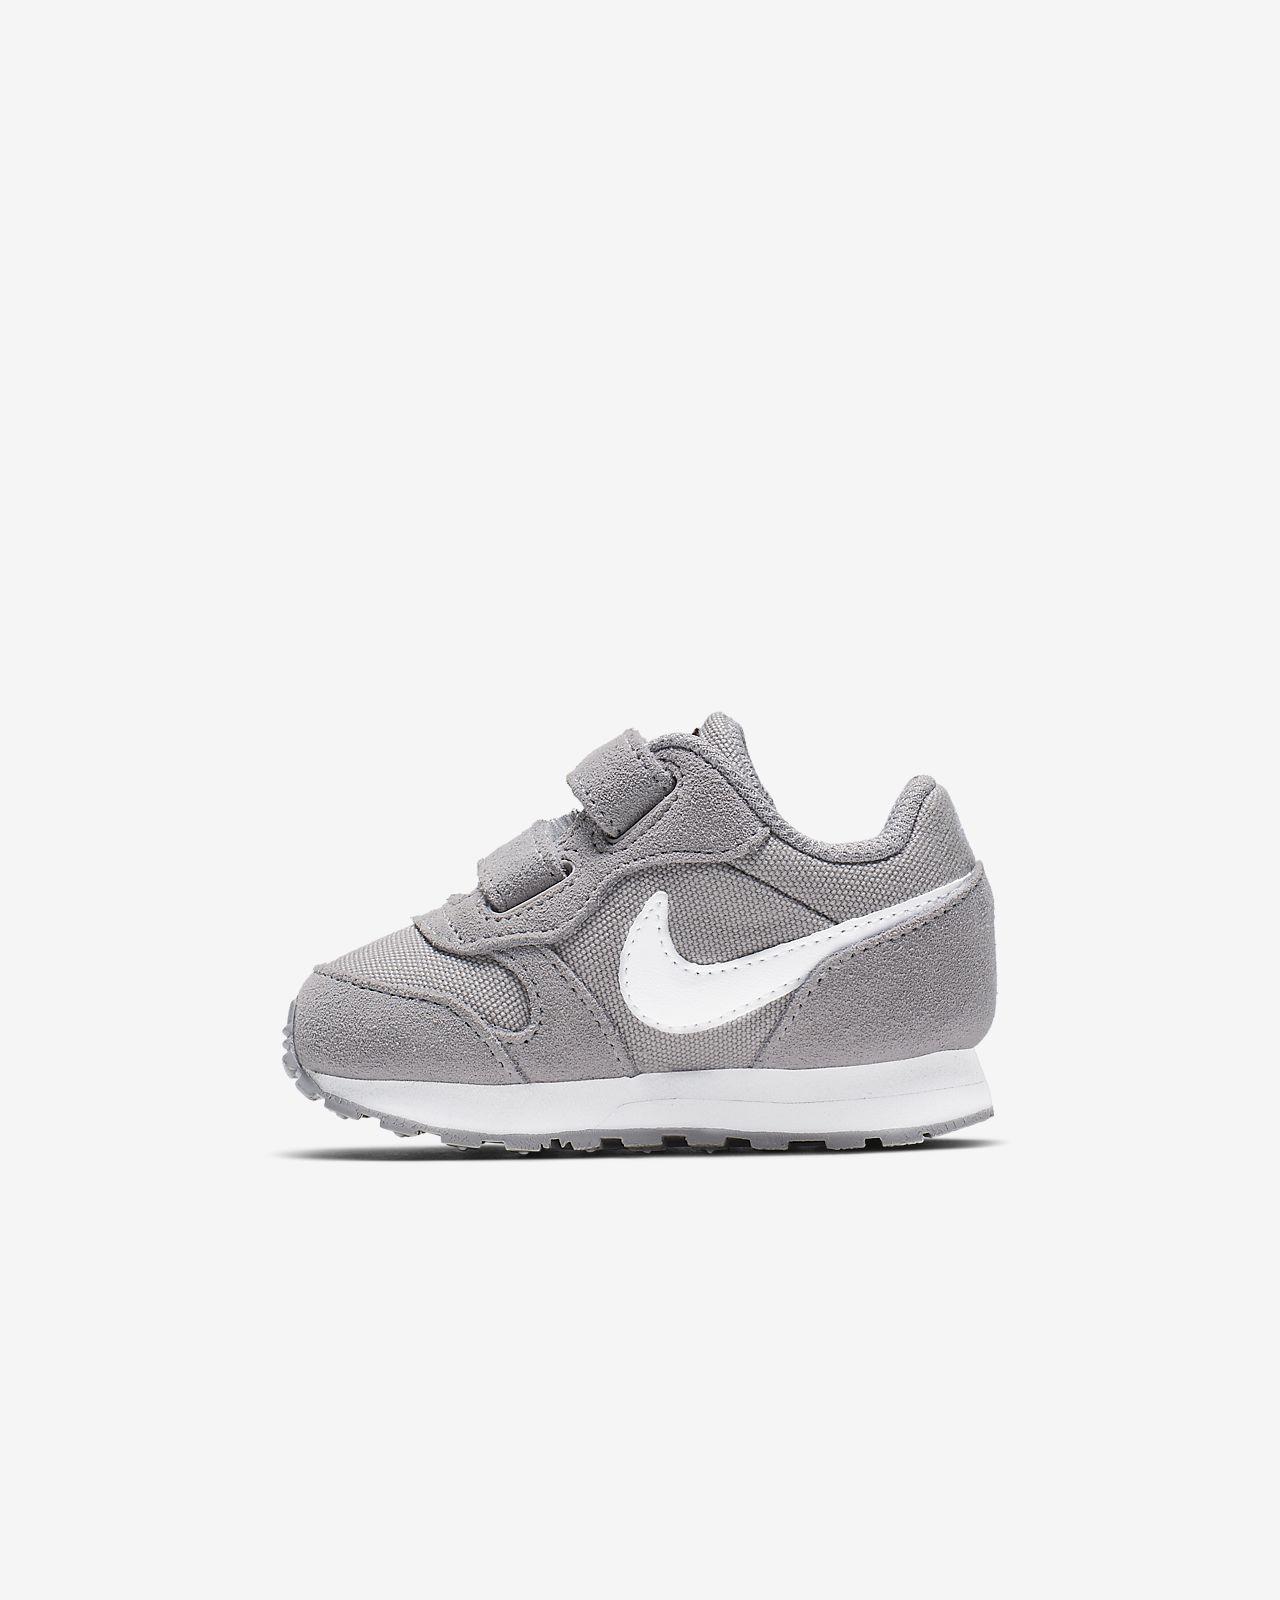 9b113a42e89b5 Chaussure Nike MD Runner 2 PE pour Bébé Petit enfant. Nike.com FR